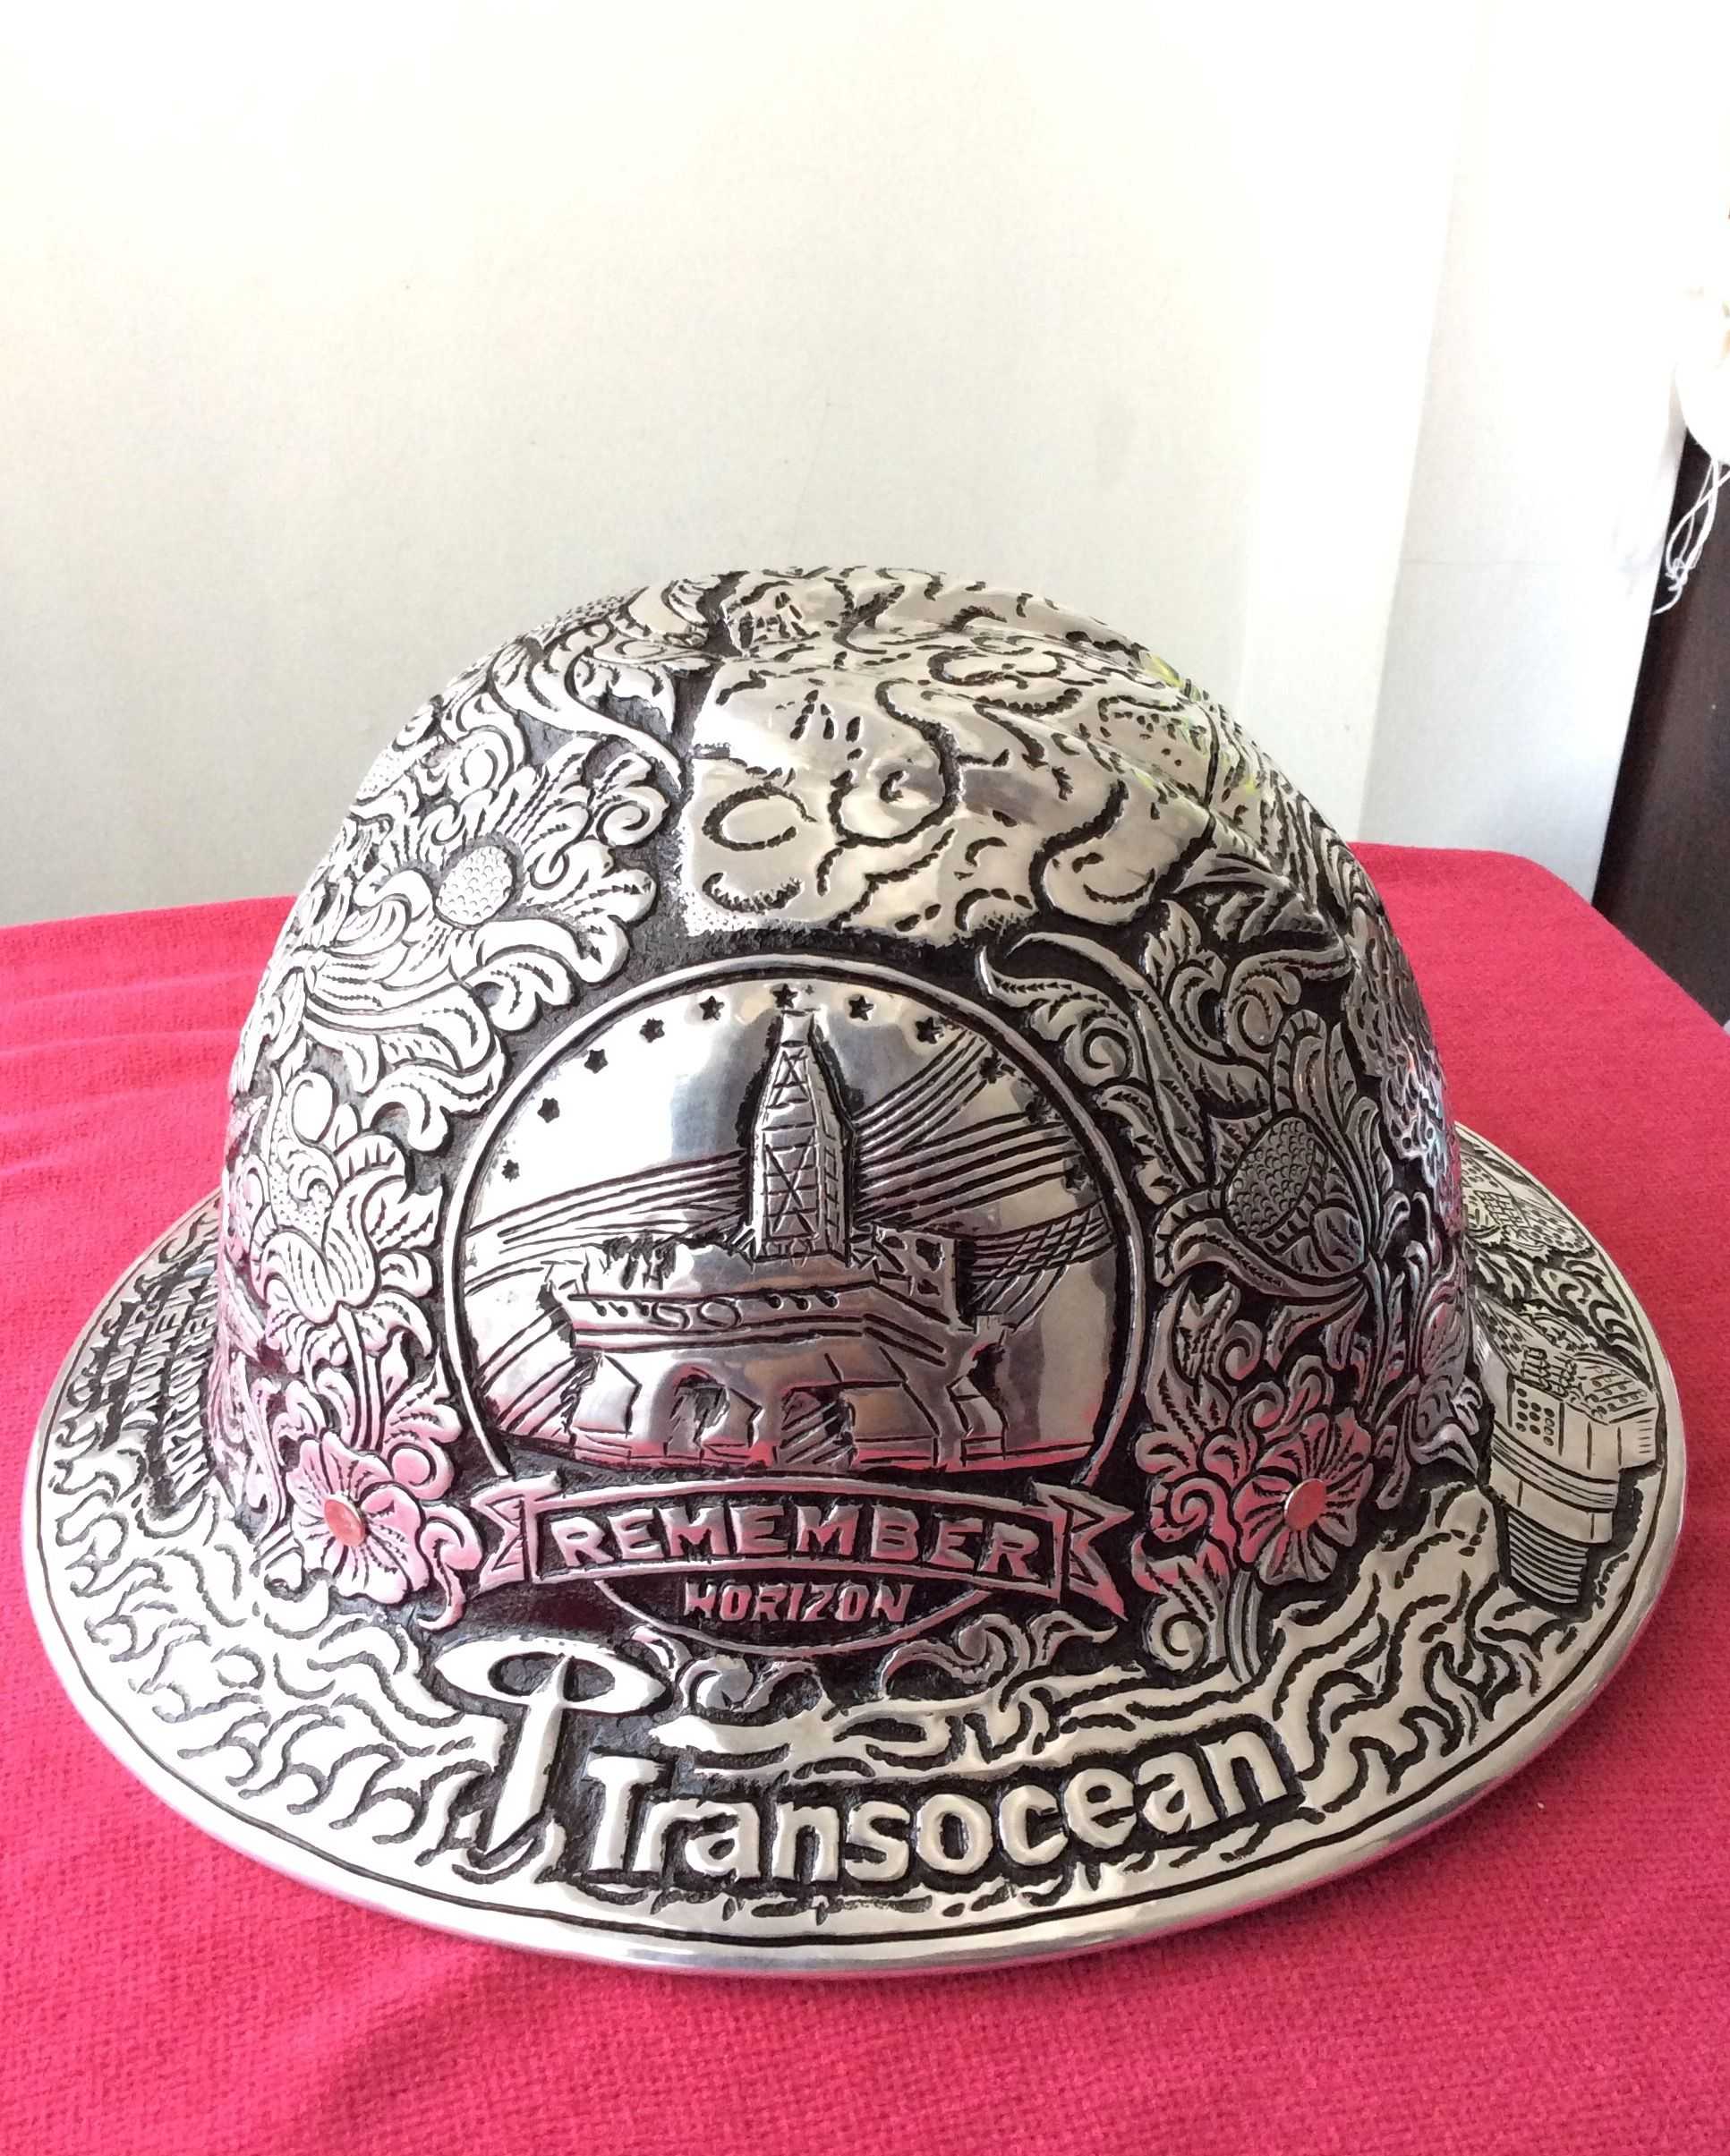 0c5e726a33f Remember  DeepwaterHorizon  Rig Engraved metal  hardhat for souvenirs